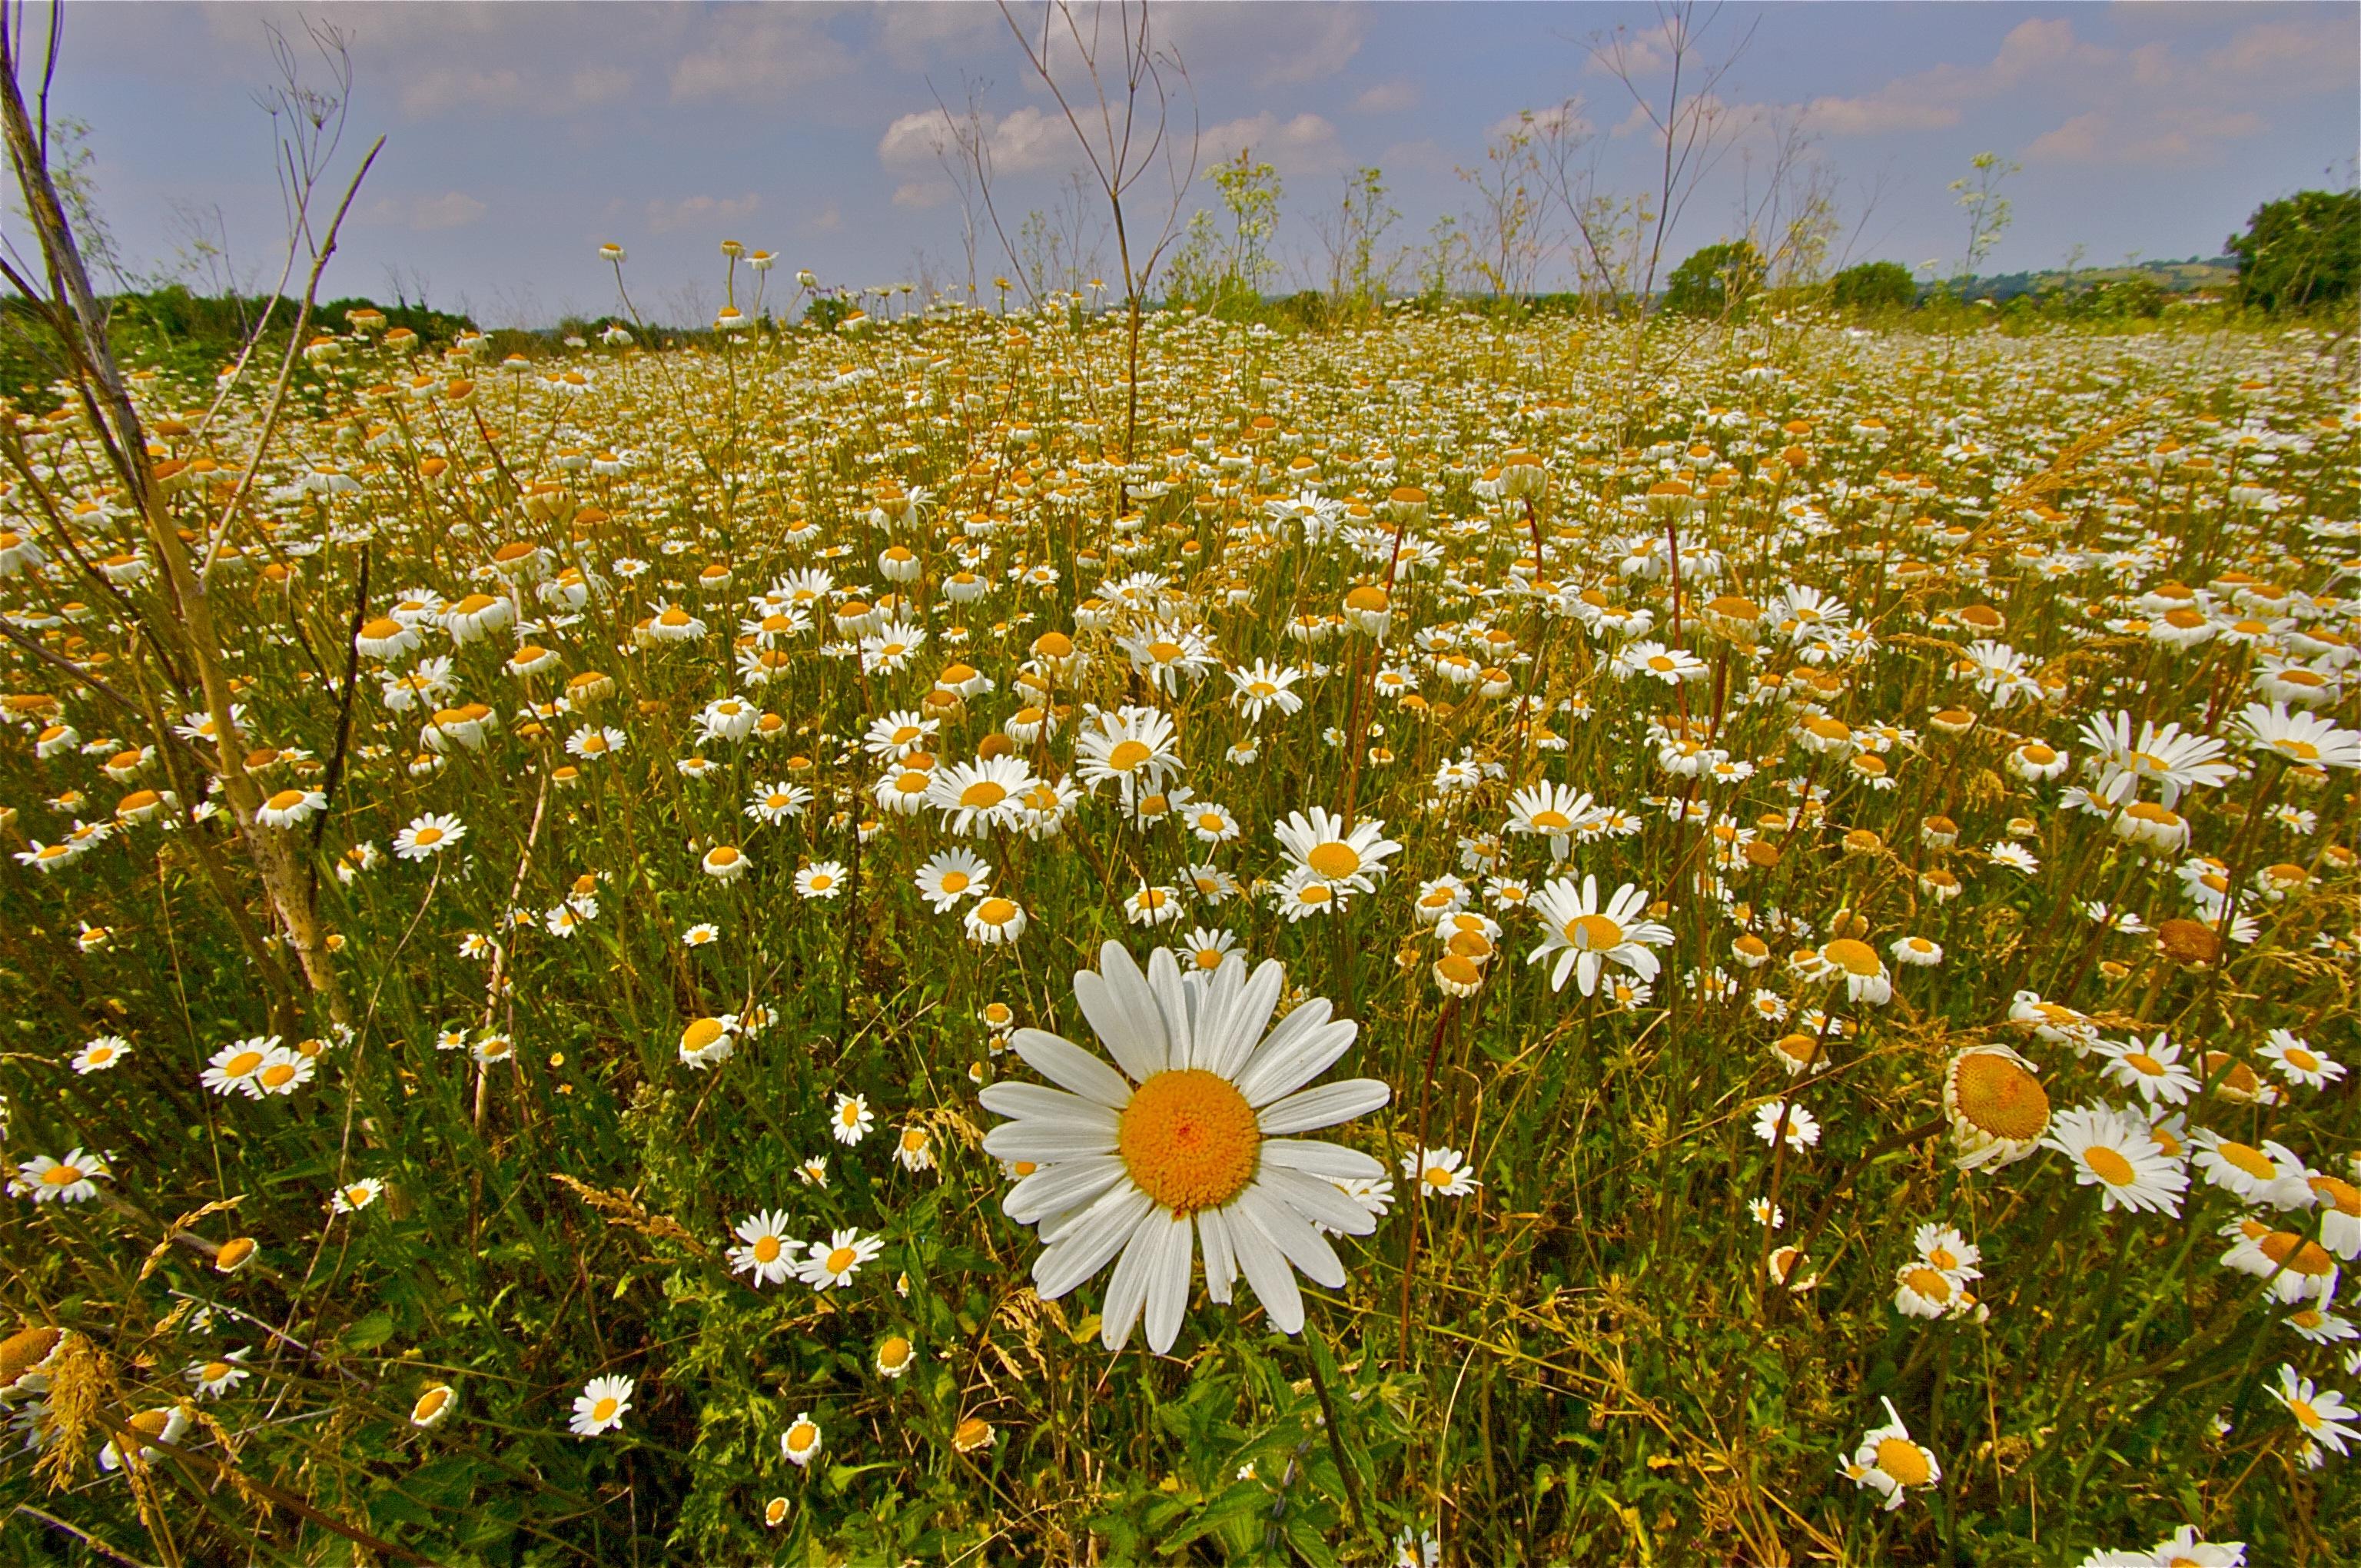 daisy meadow by stuartreading